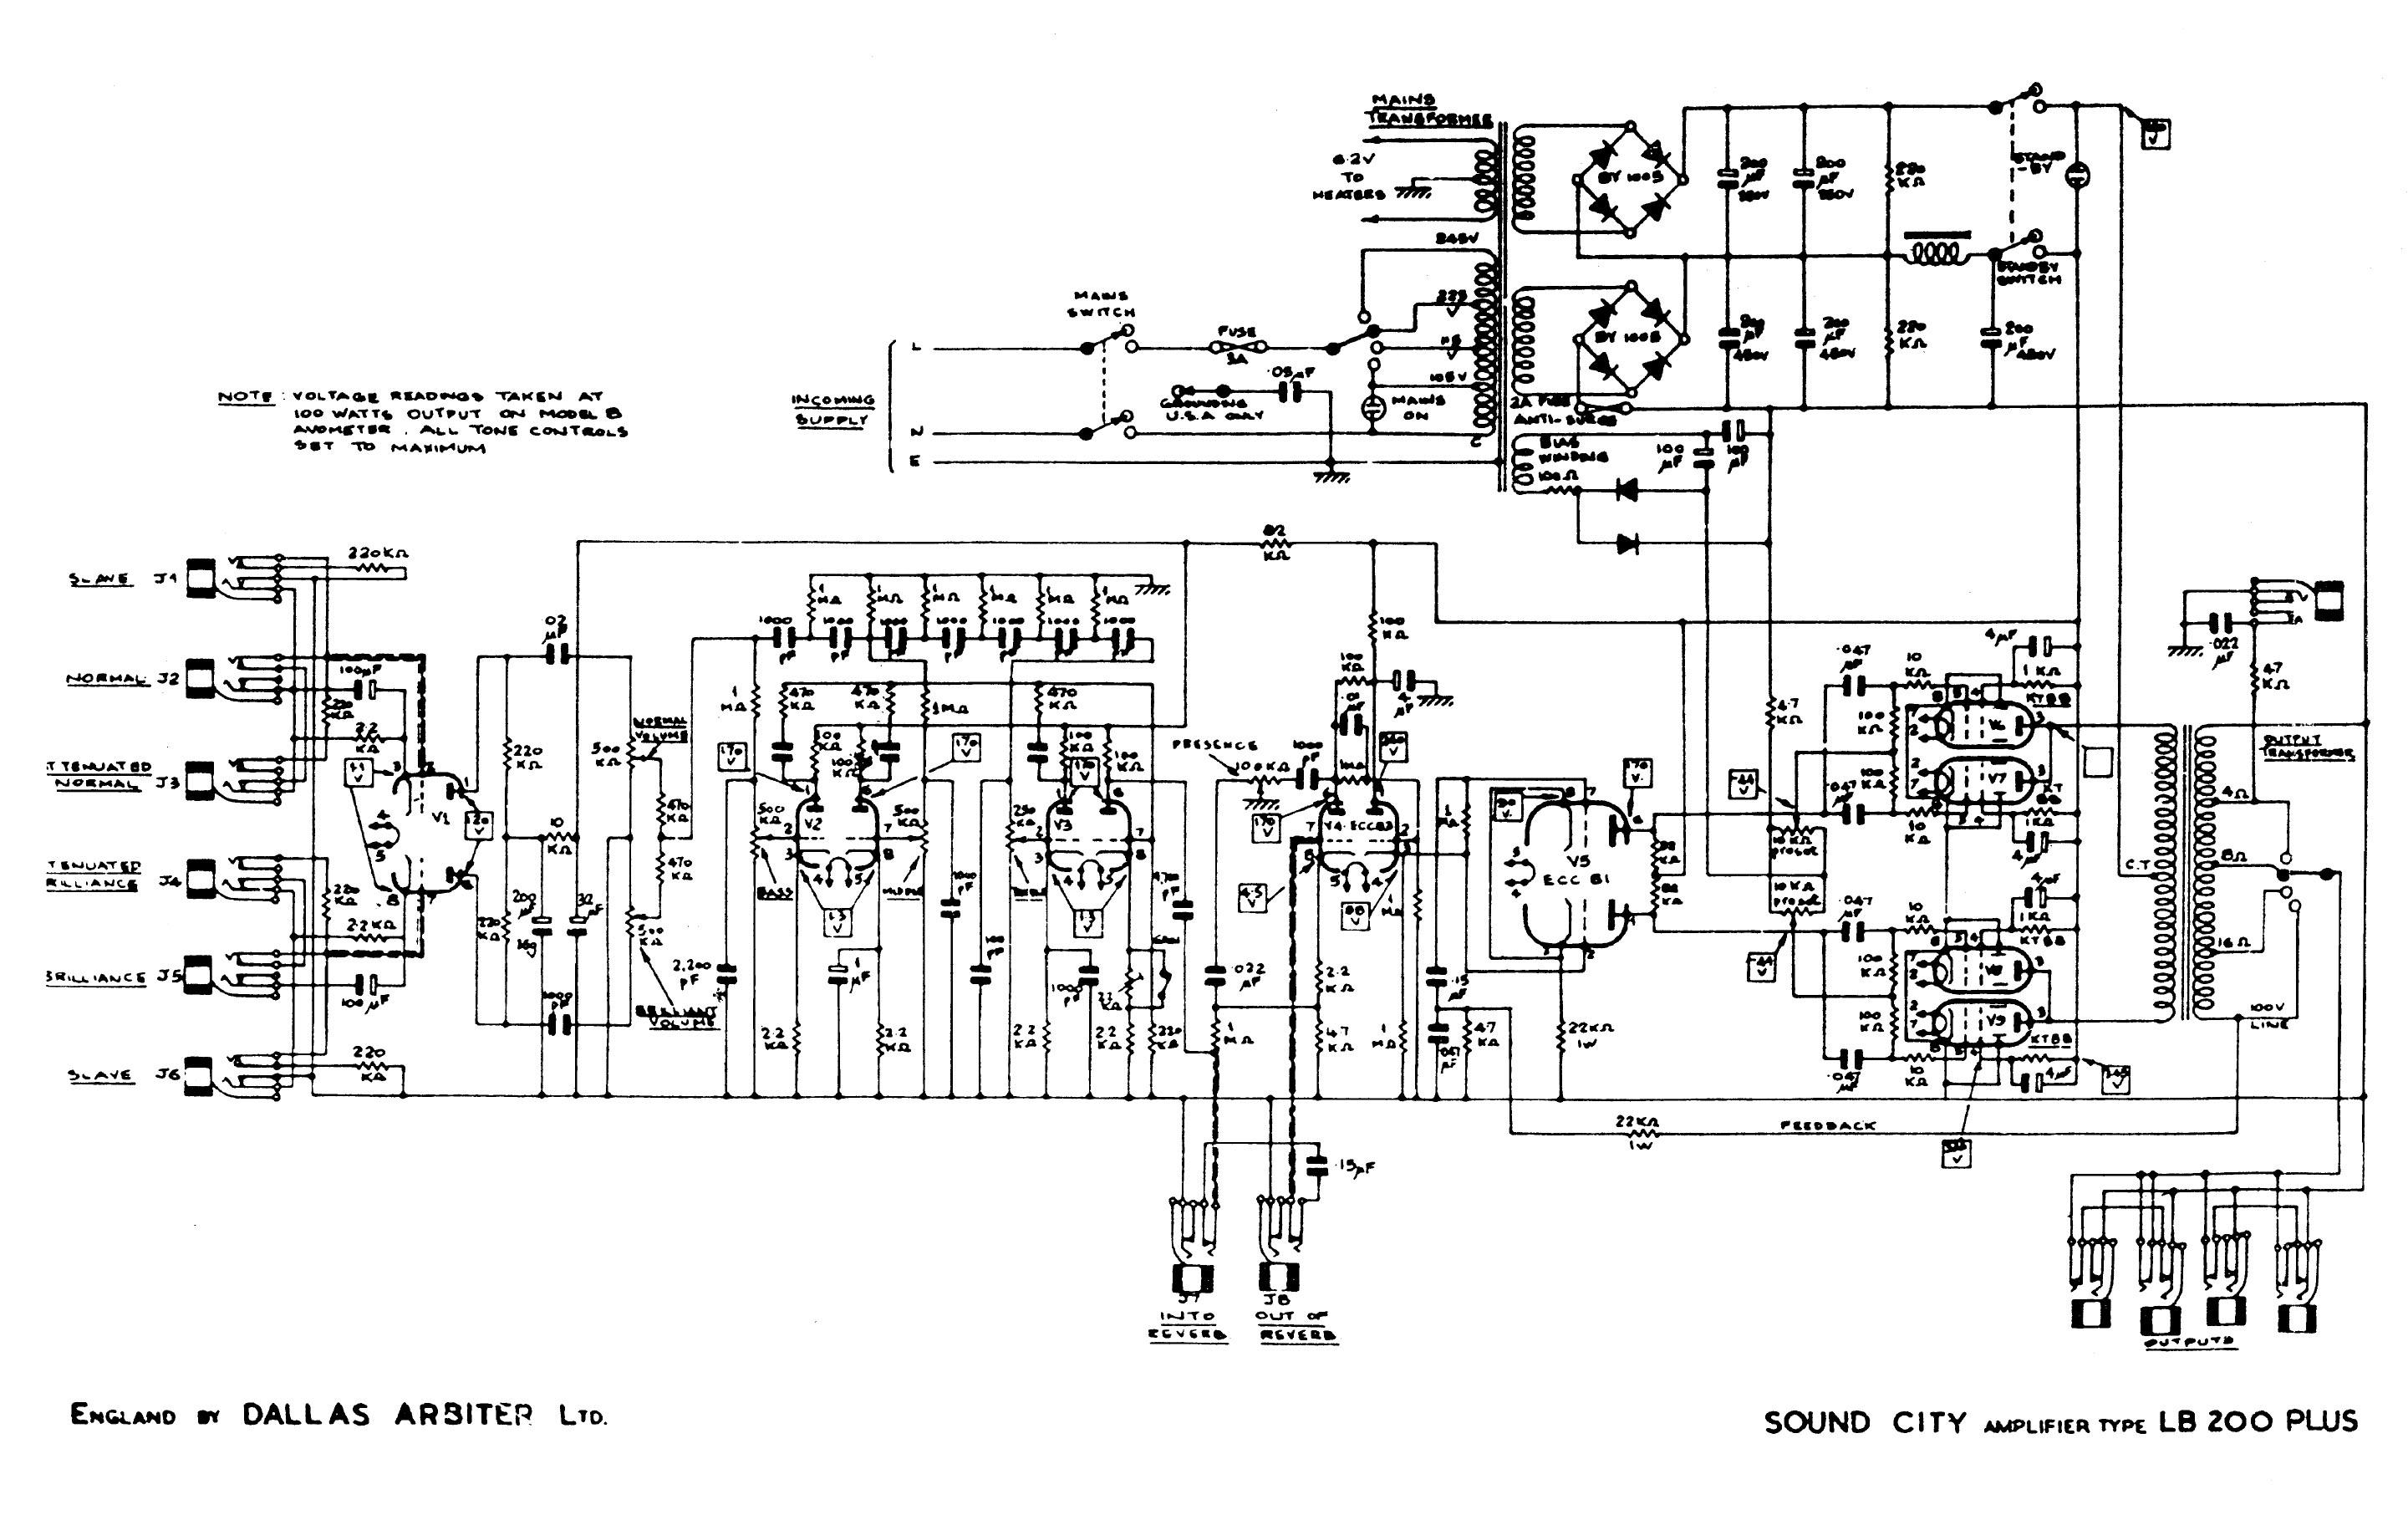 Sound City 200 Plus   IRATION AUDIO on marshall avt 100 input schematic, guitar amp effects loop schematic, soldano atomic 16 schematic, silvertone 1482 schematic, peavey classic 50 schematic, ibanez tsa15h schematic, mig 100 schematic, slo-100 schematic,